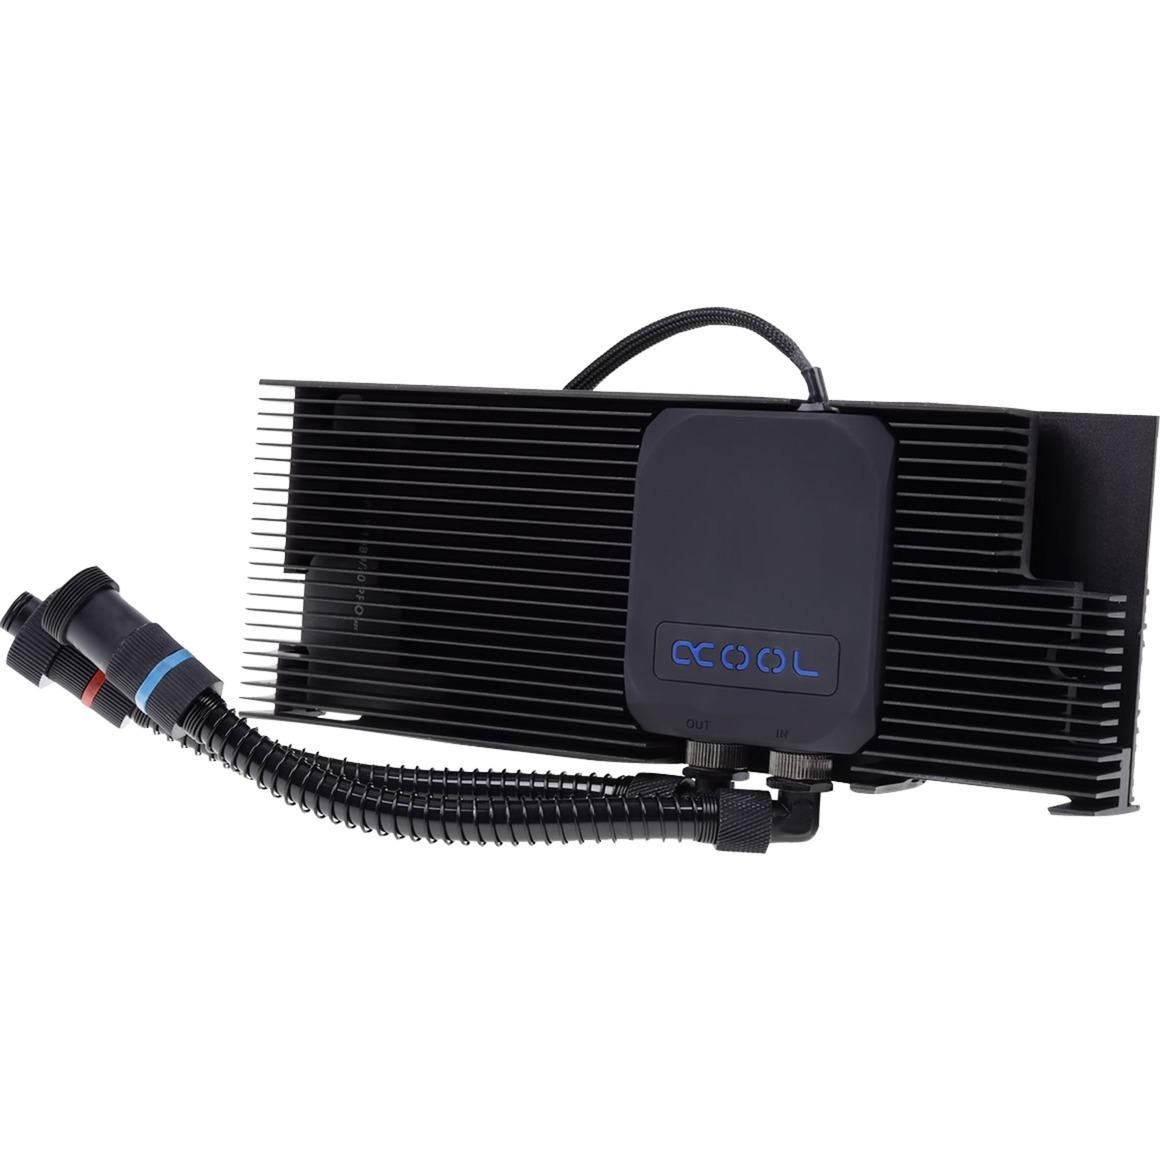 Eiswolf GPX Pro - Nvidia Geforce GTX 1080 / 1070 M01 Negro, Refrigeración por agua